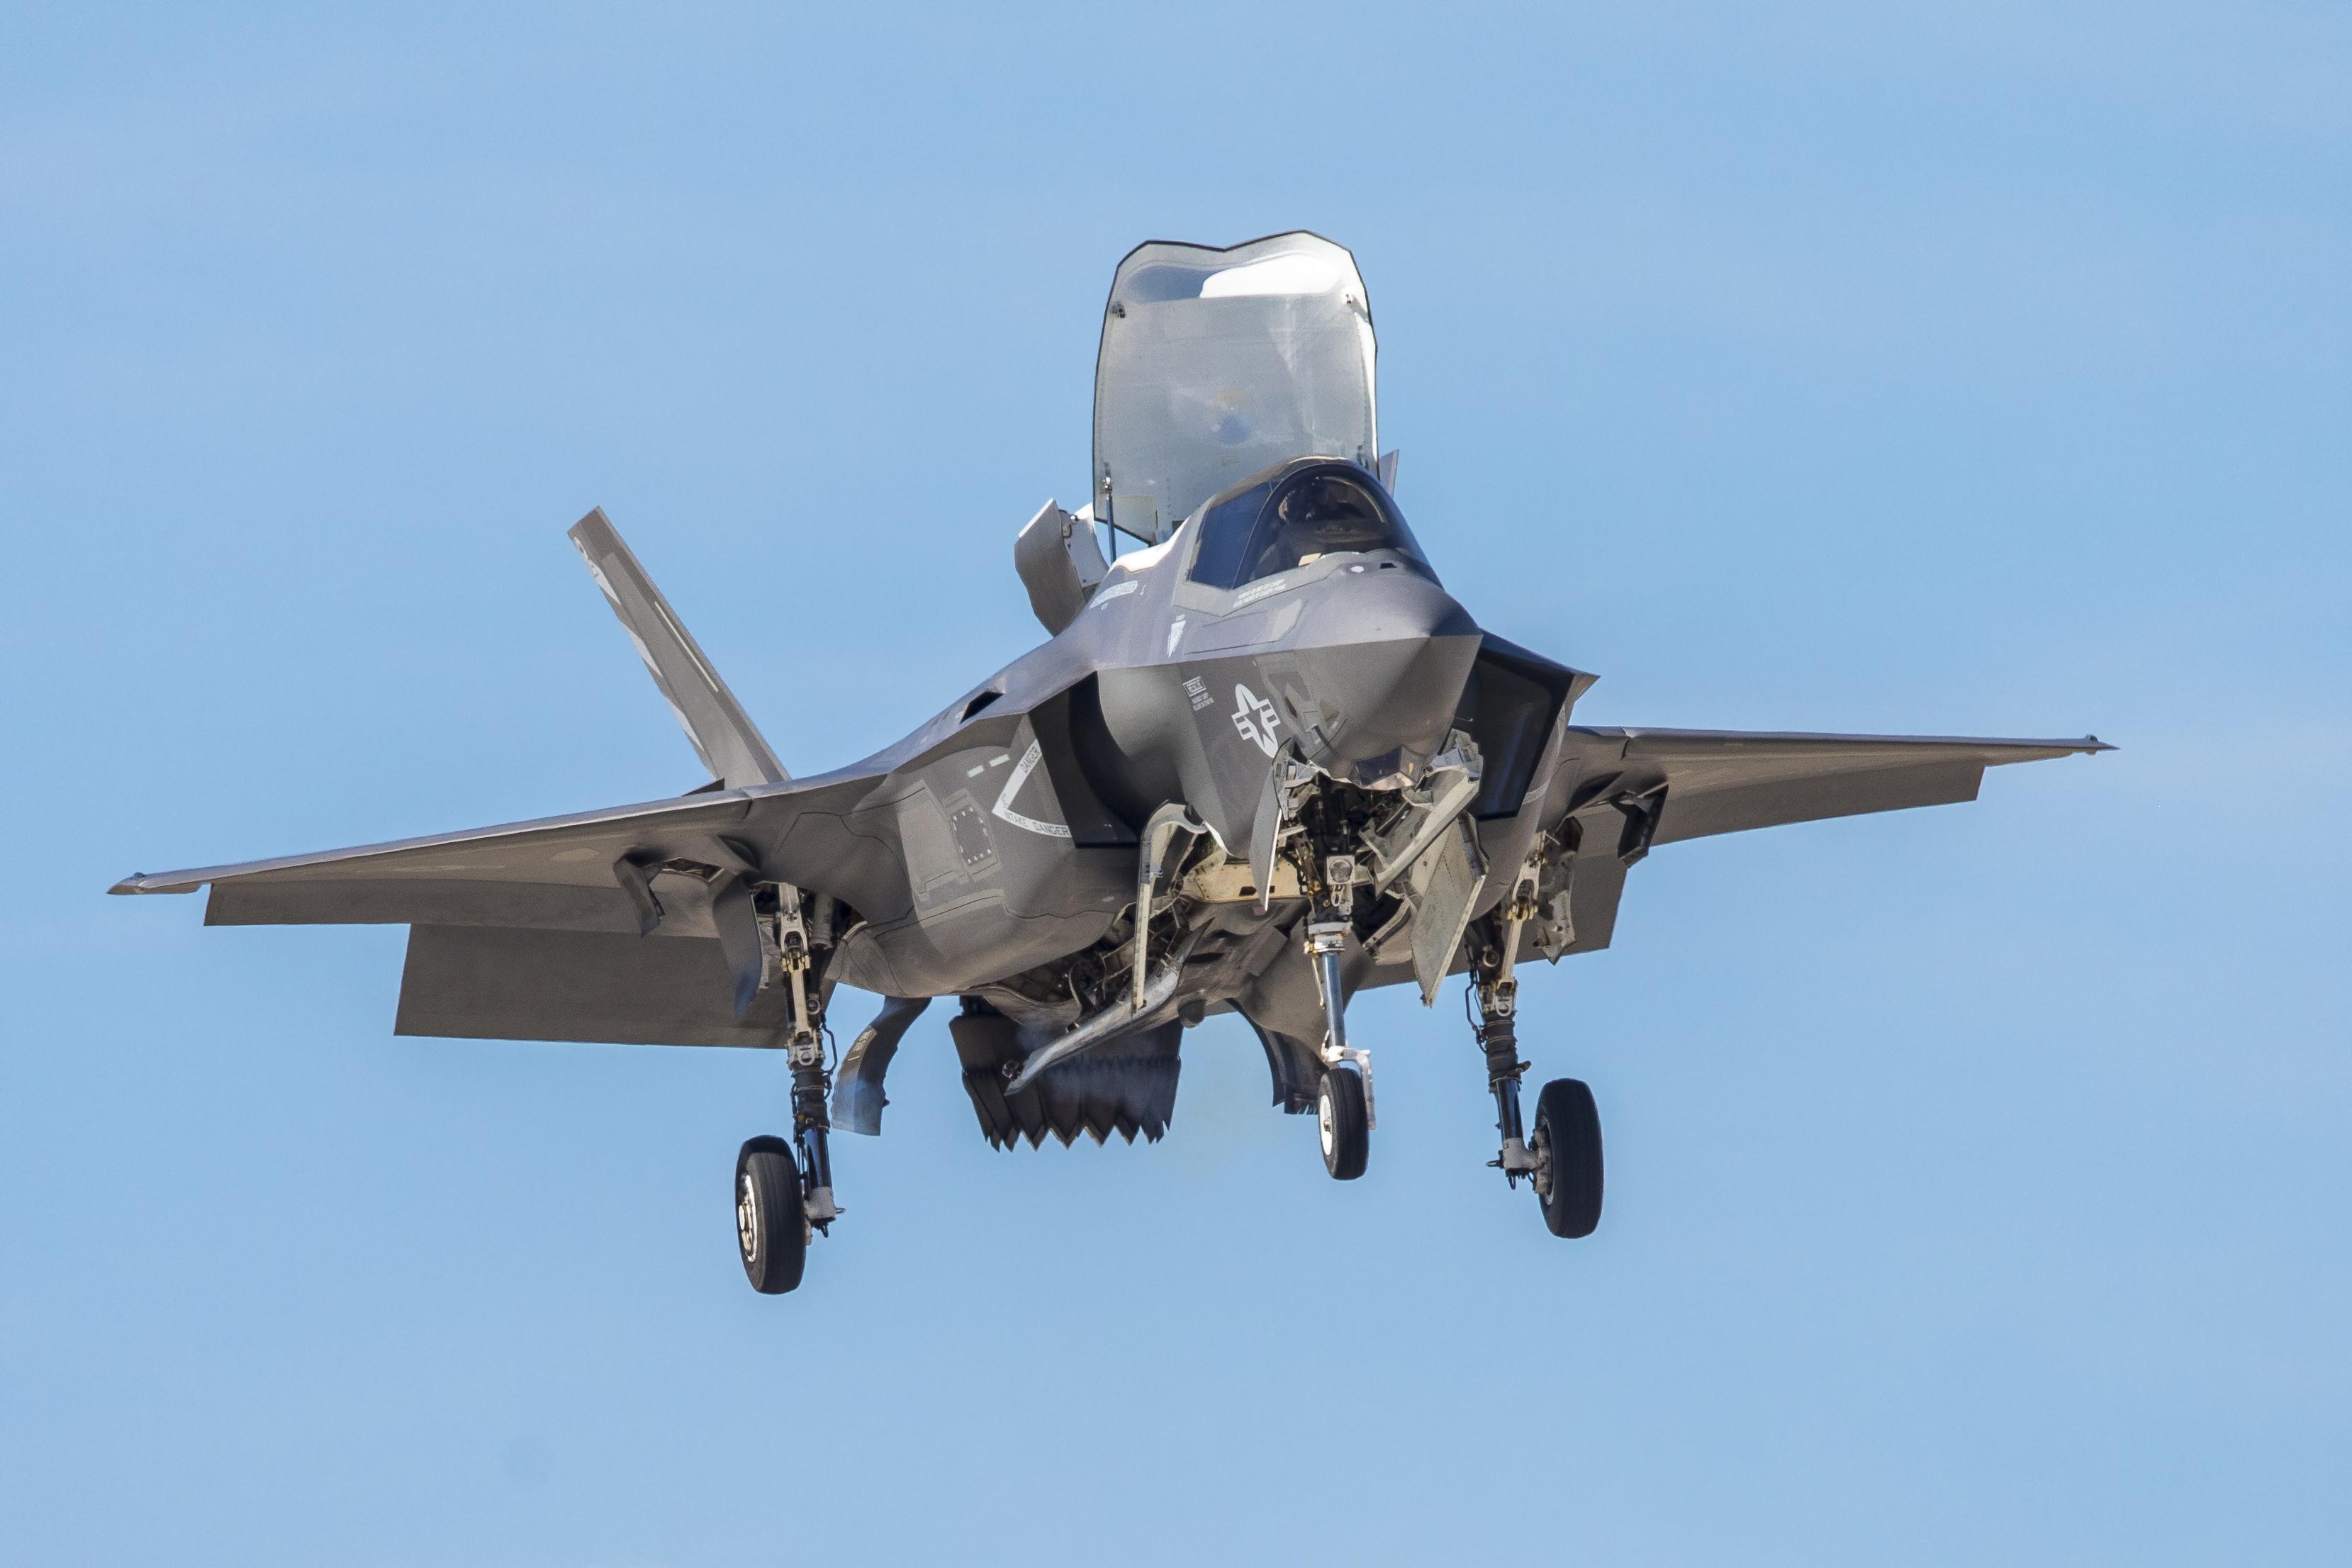 F35 hovering midair